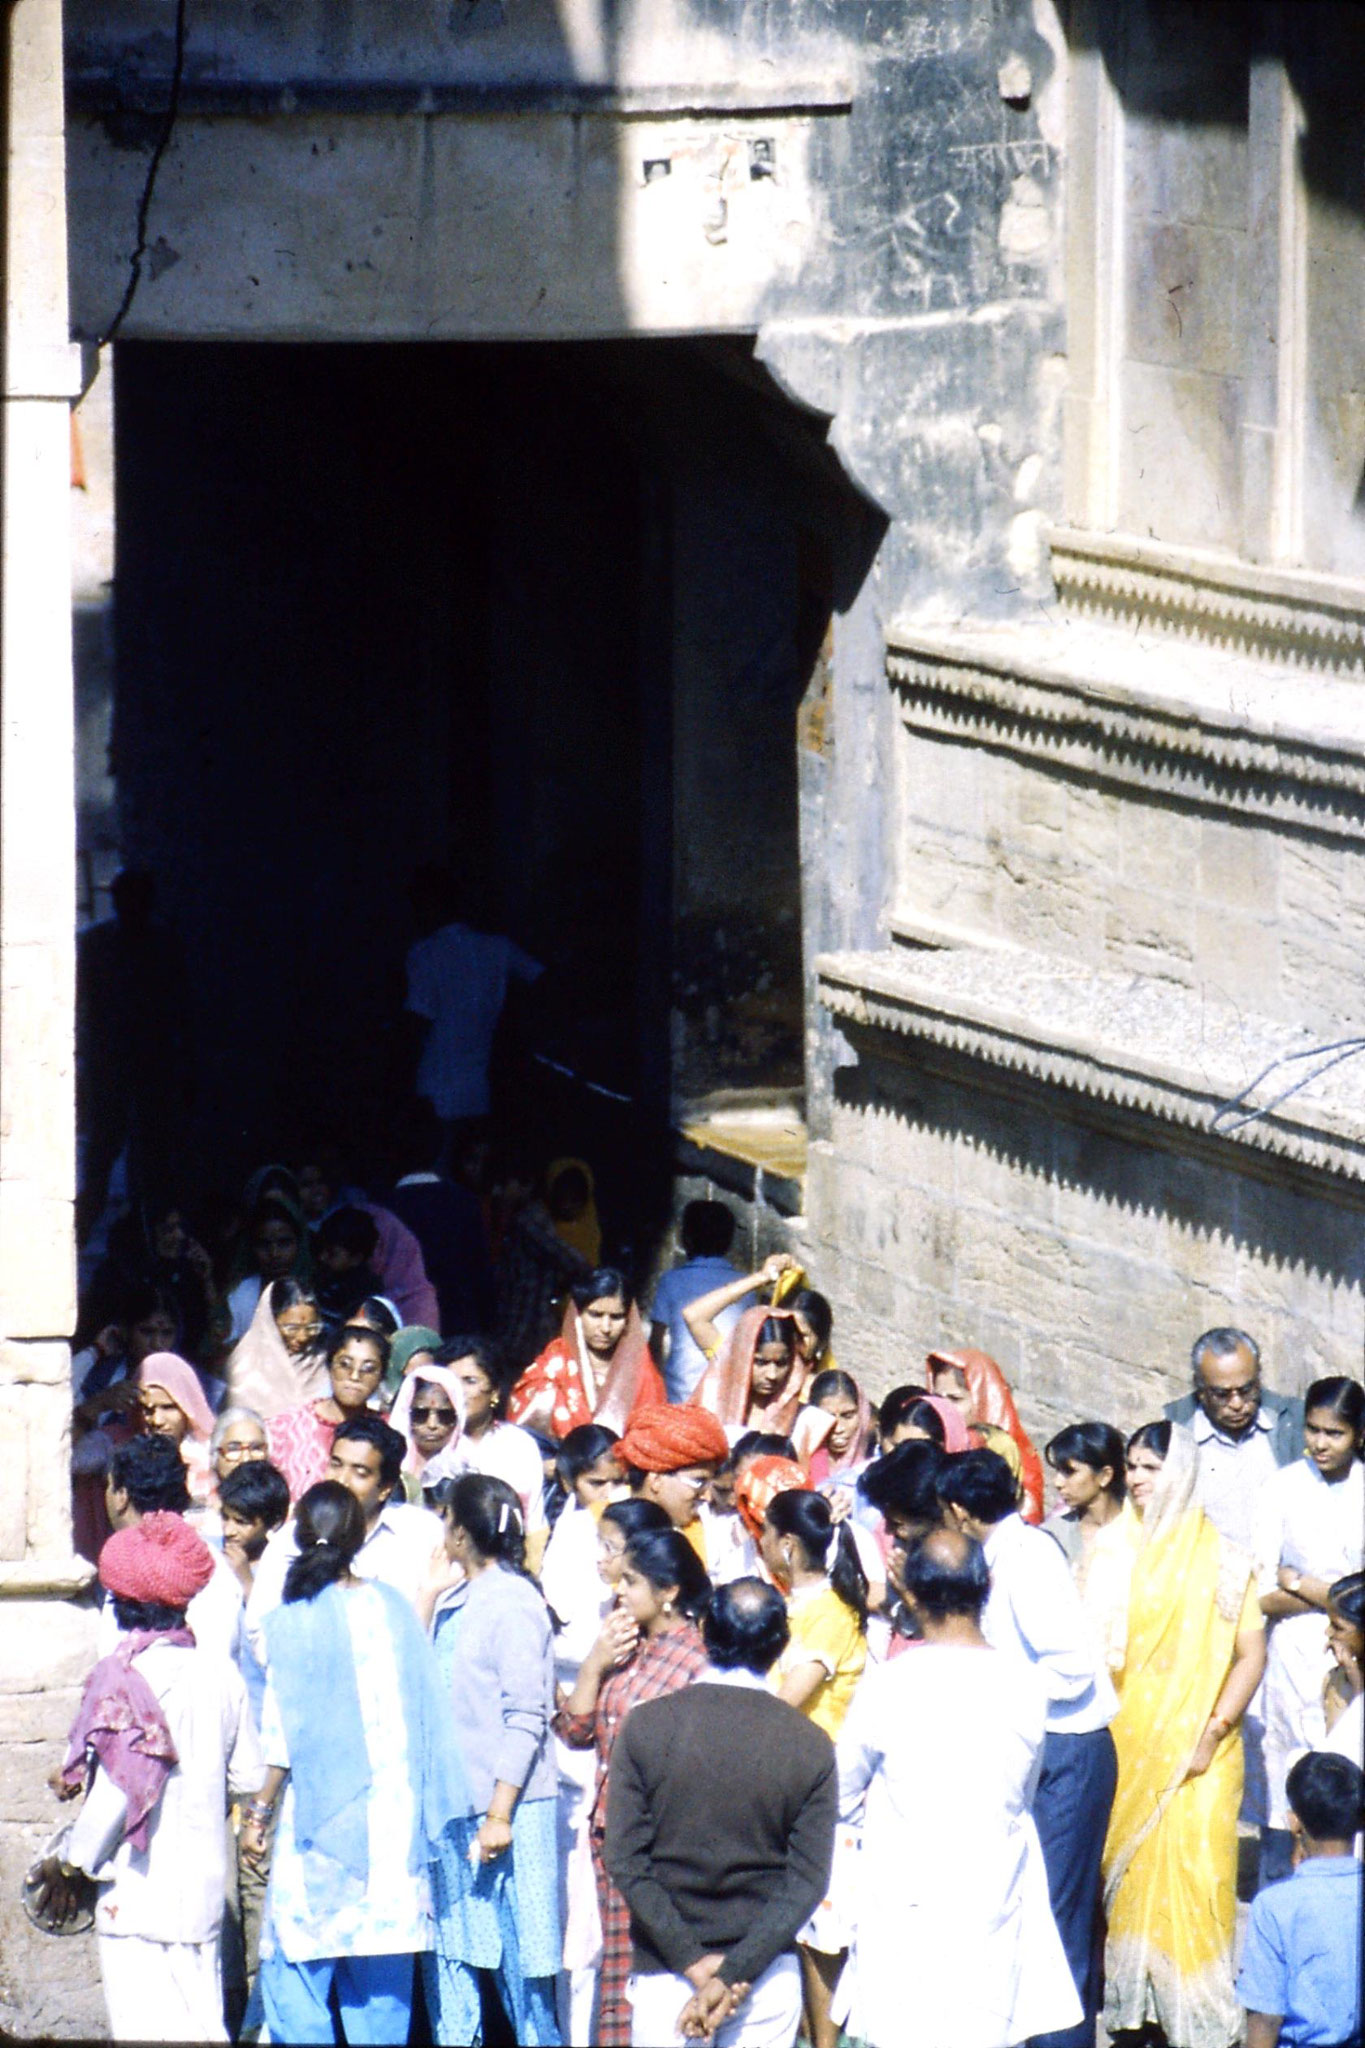 3/12/1989: 0: Jaisalmer wedding procession